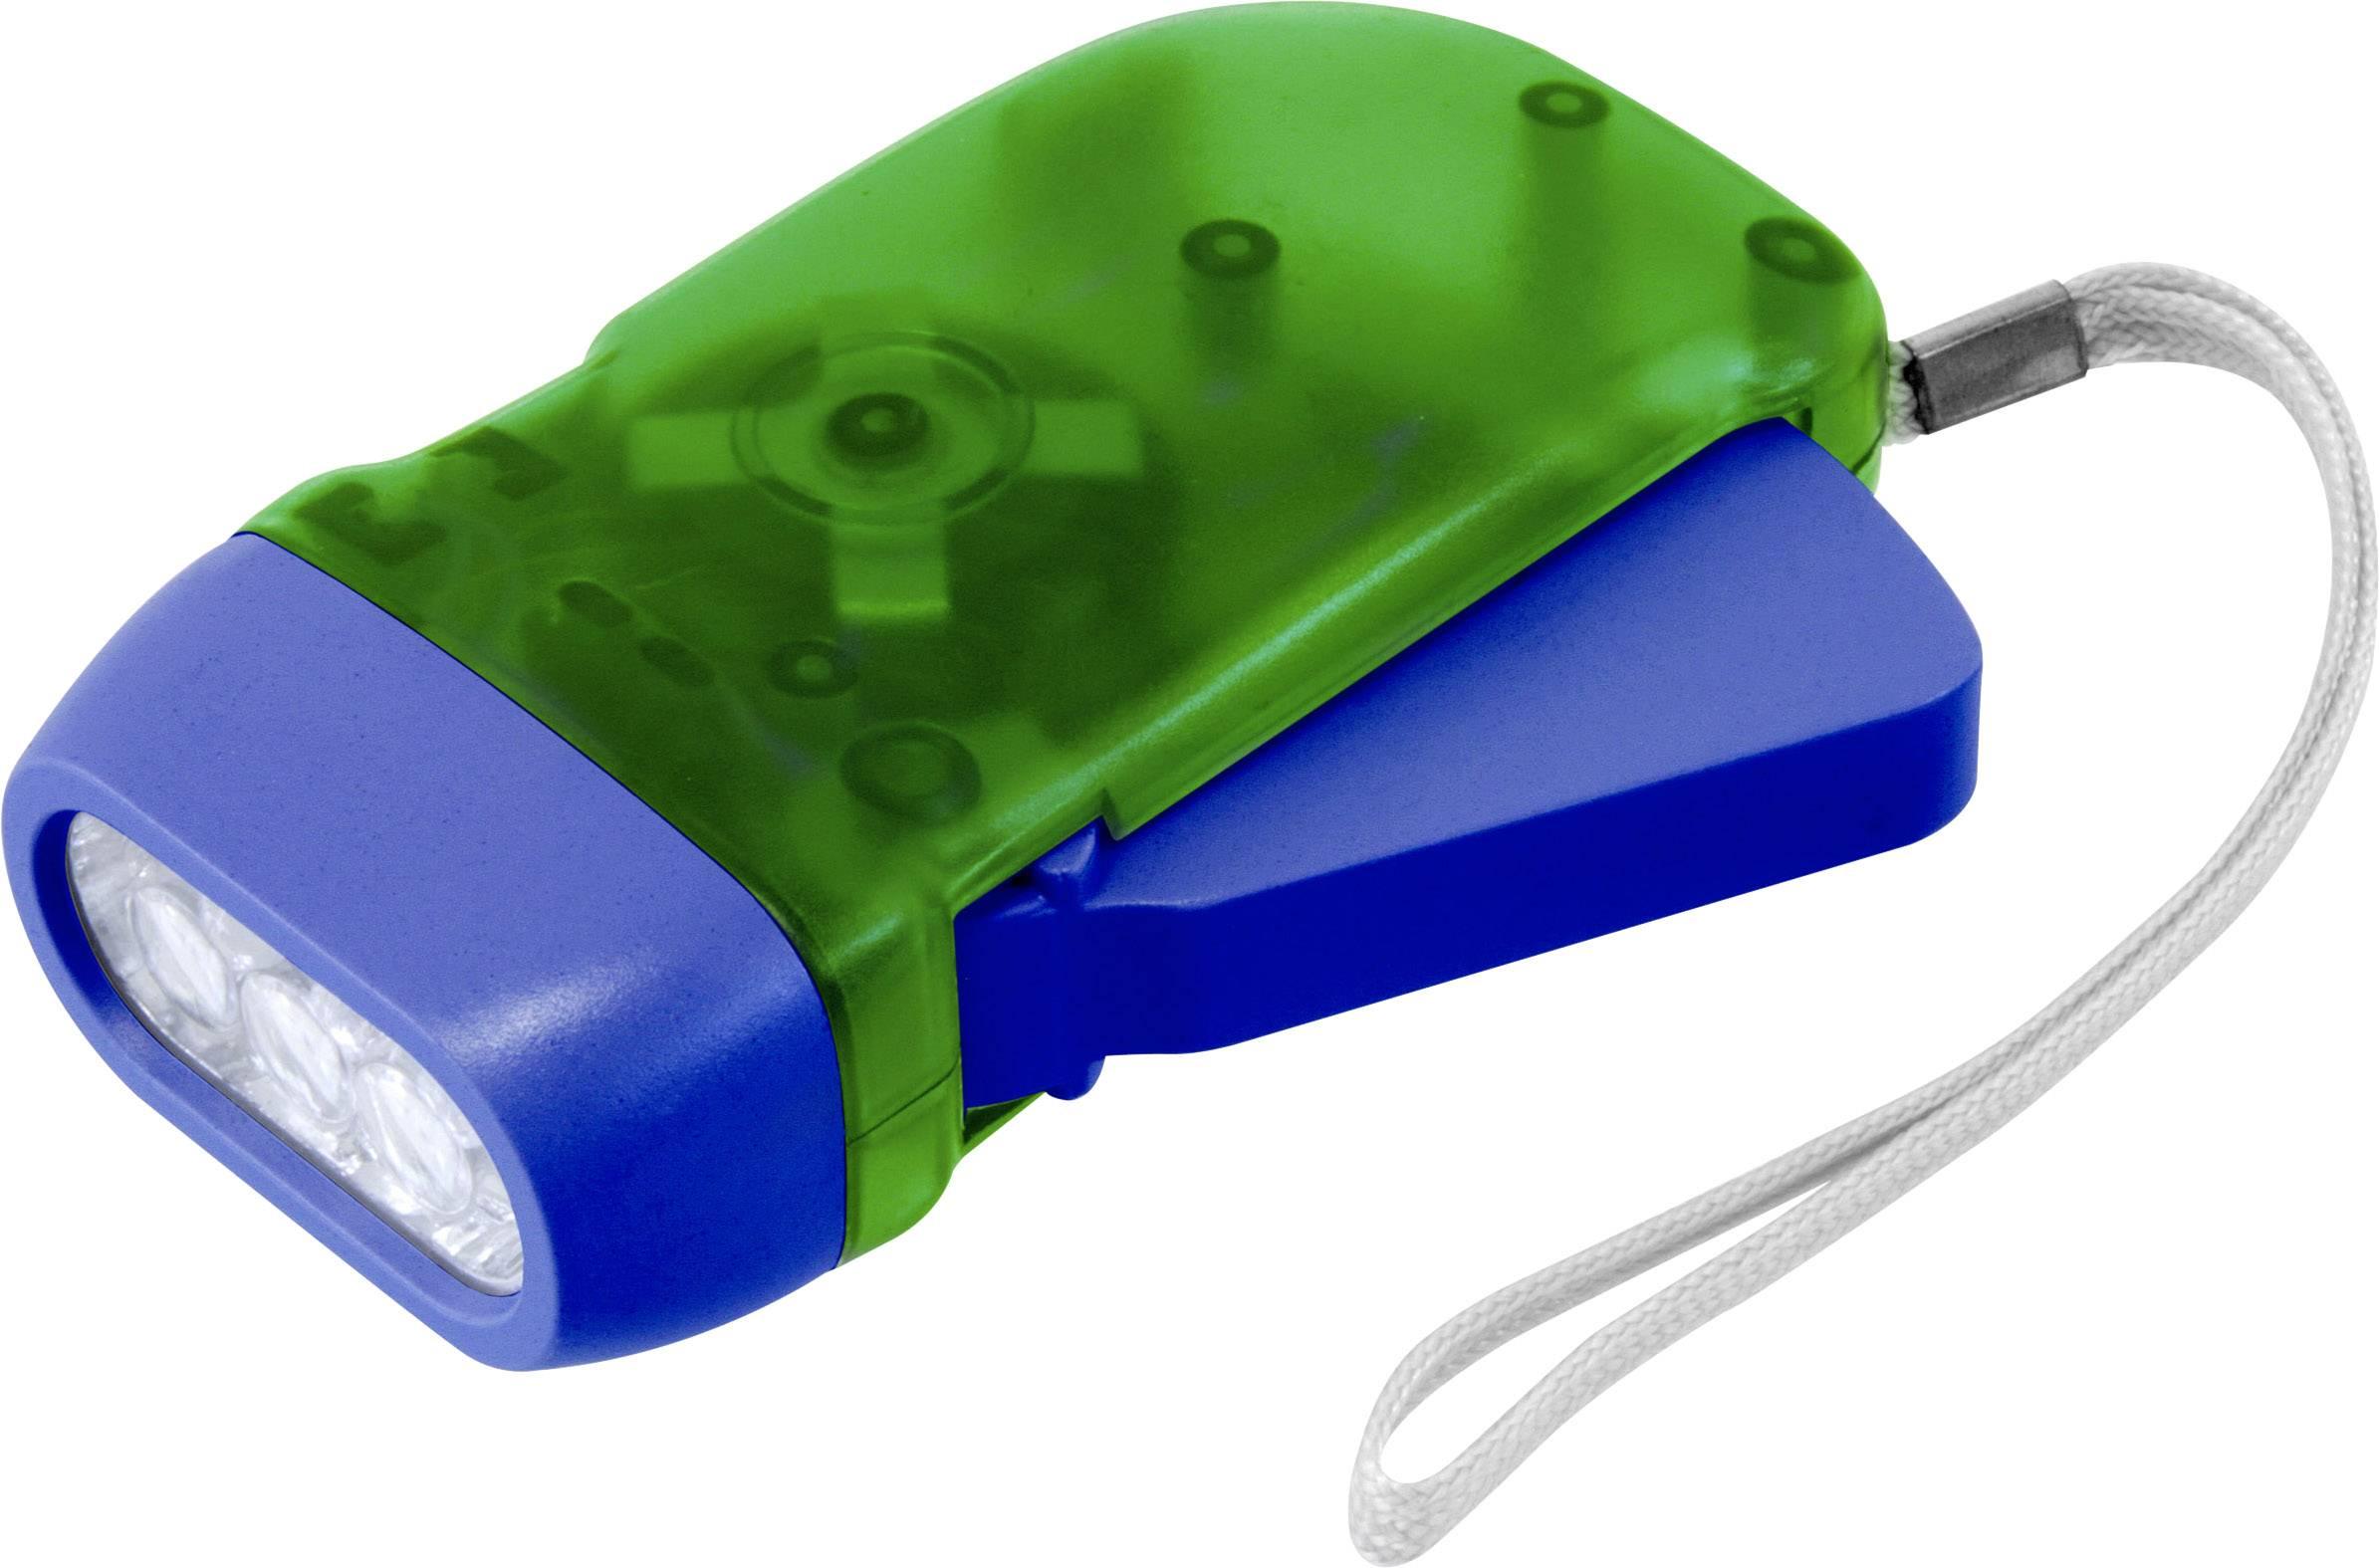 Fernglas bresser optik kinderfernglas junior mm blau grün